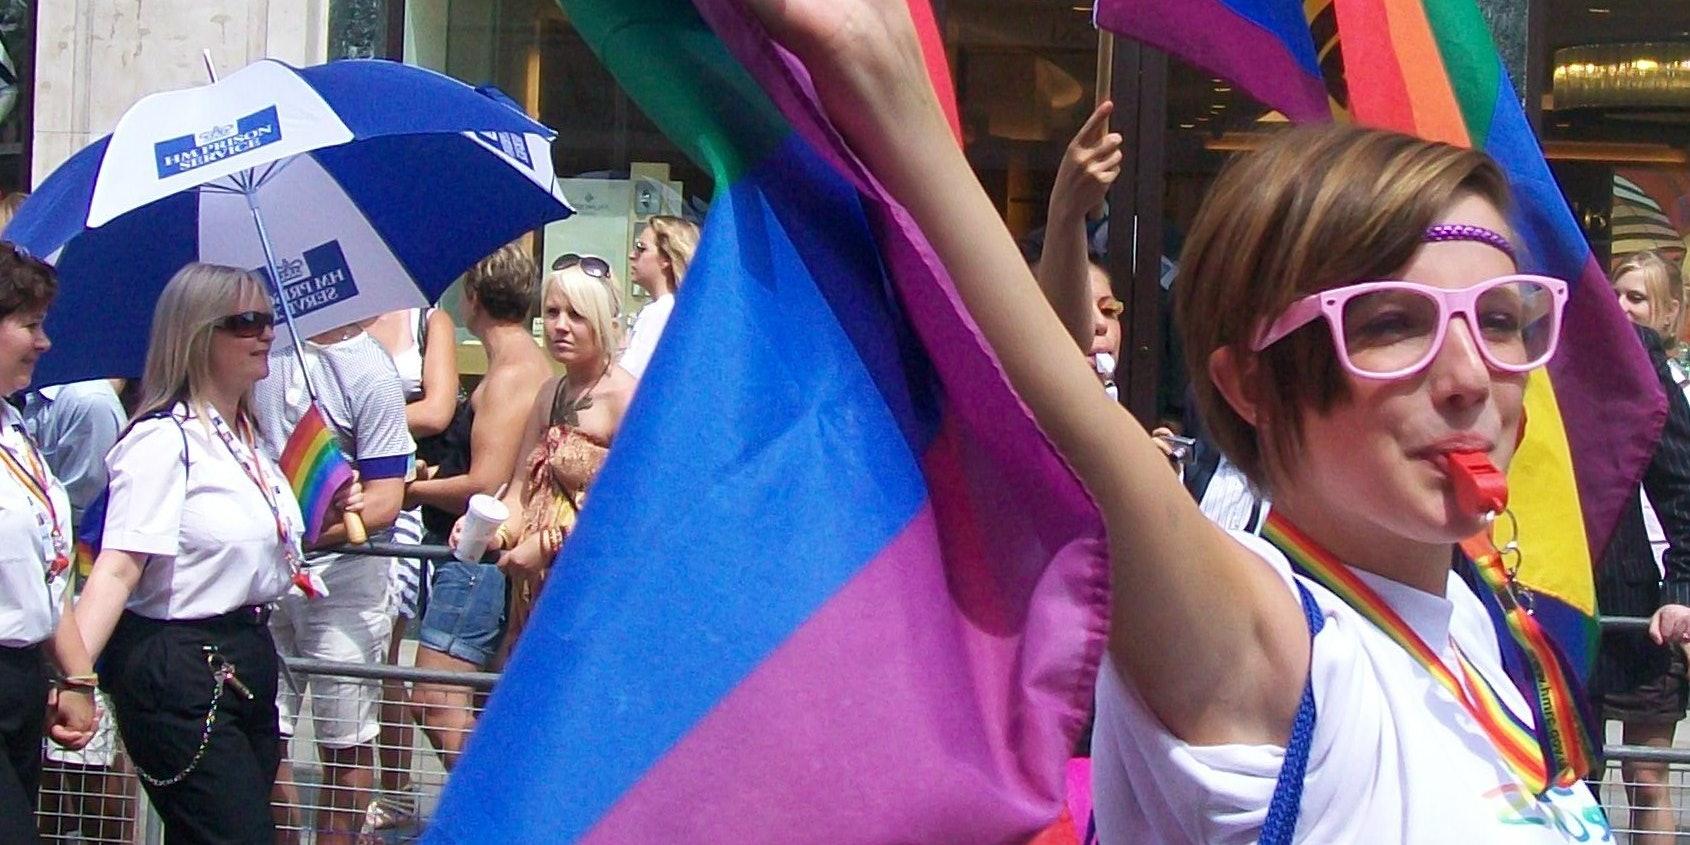 Get pride, not homophobia